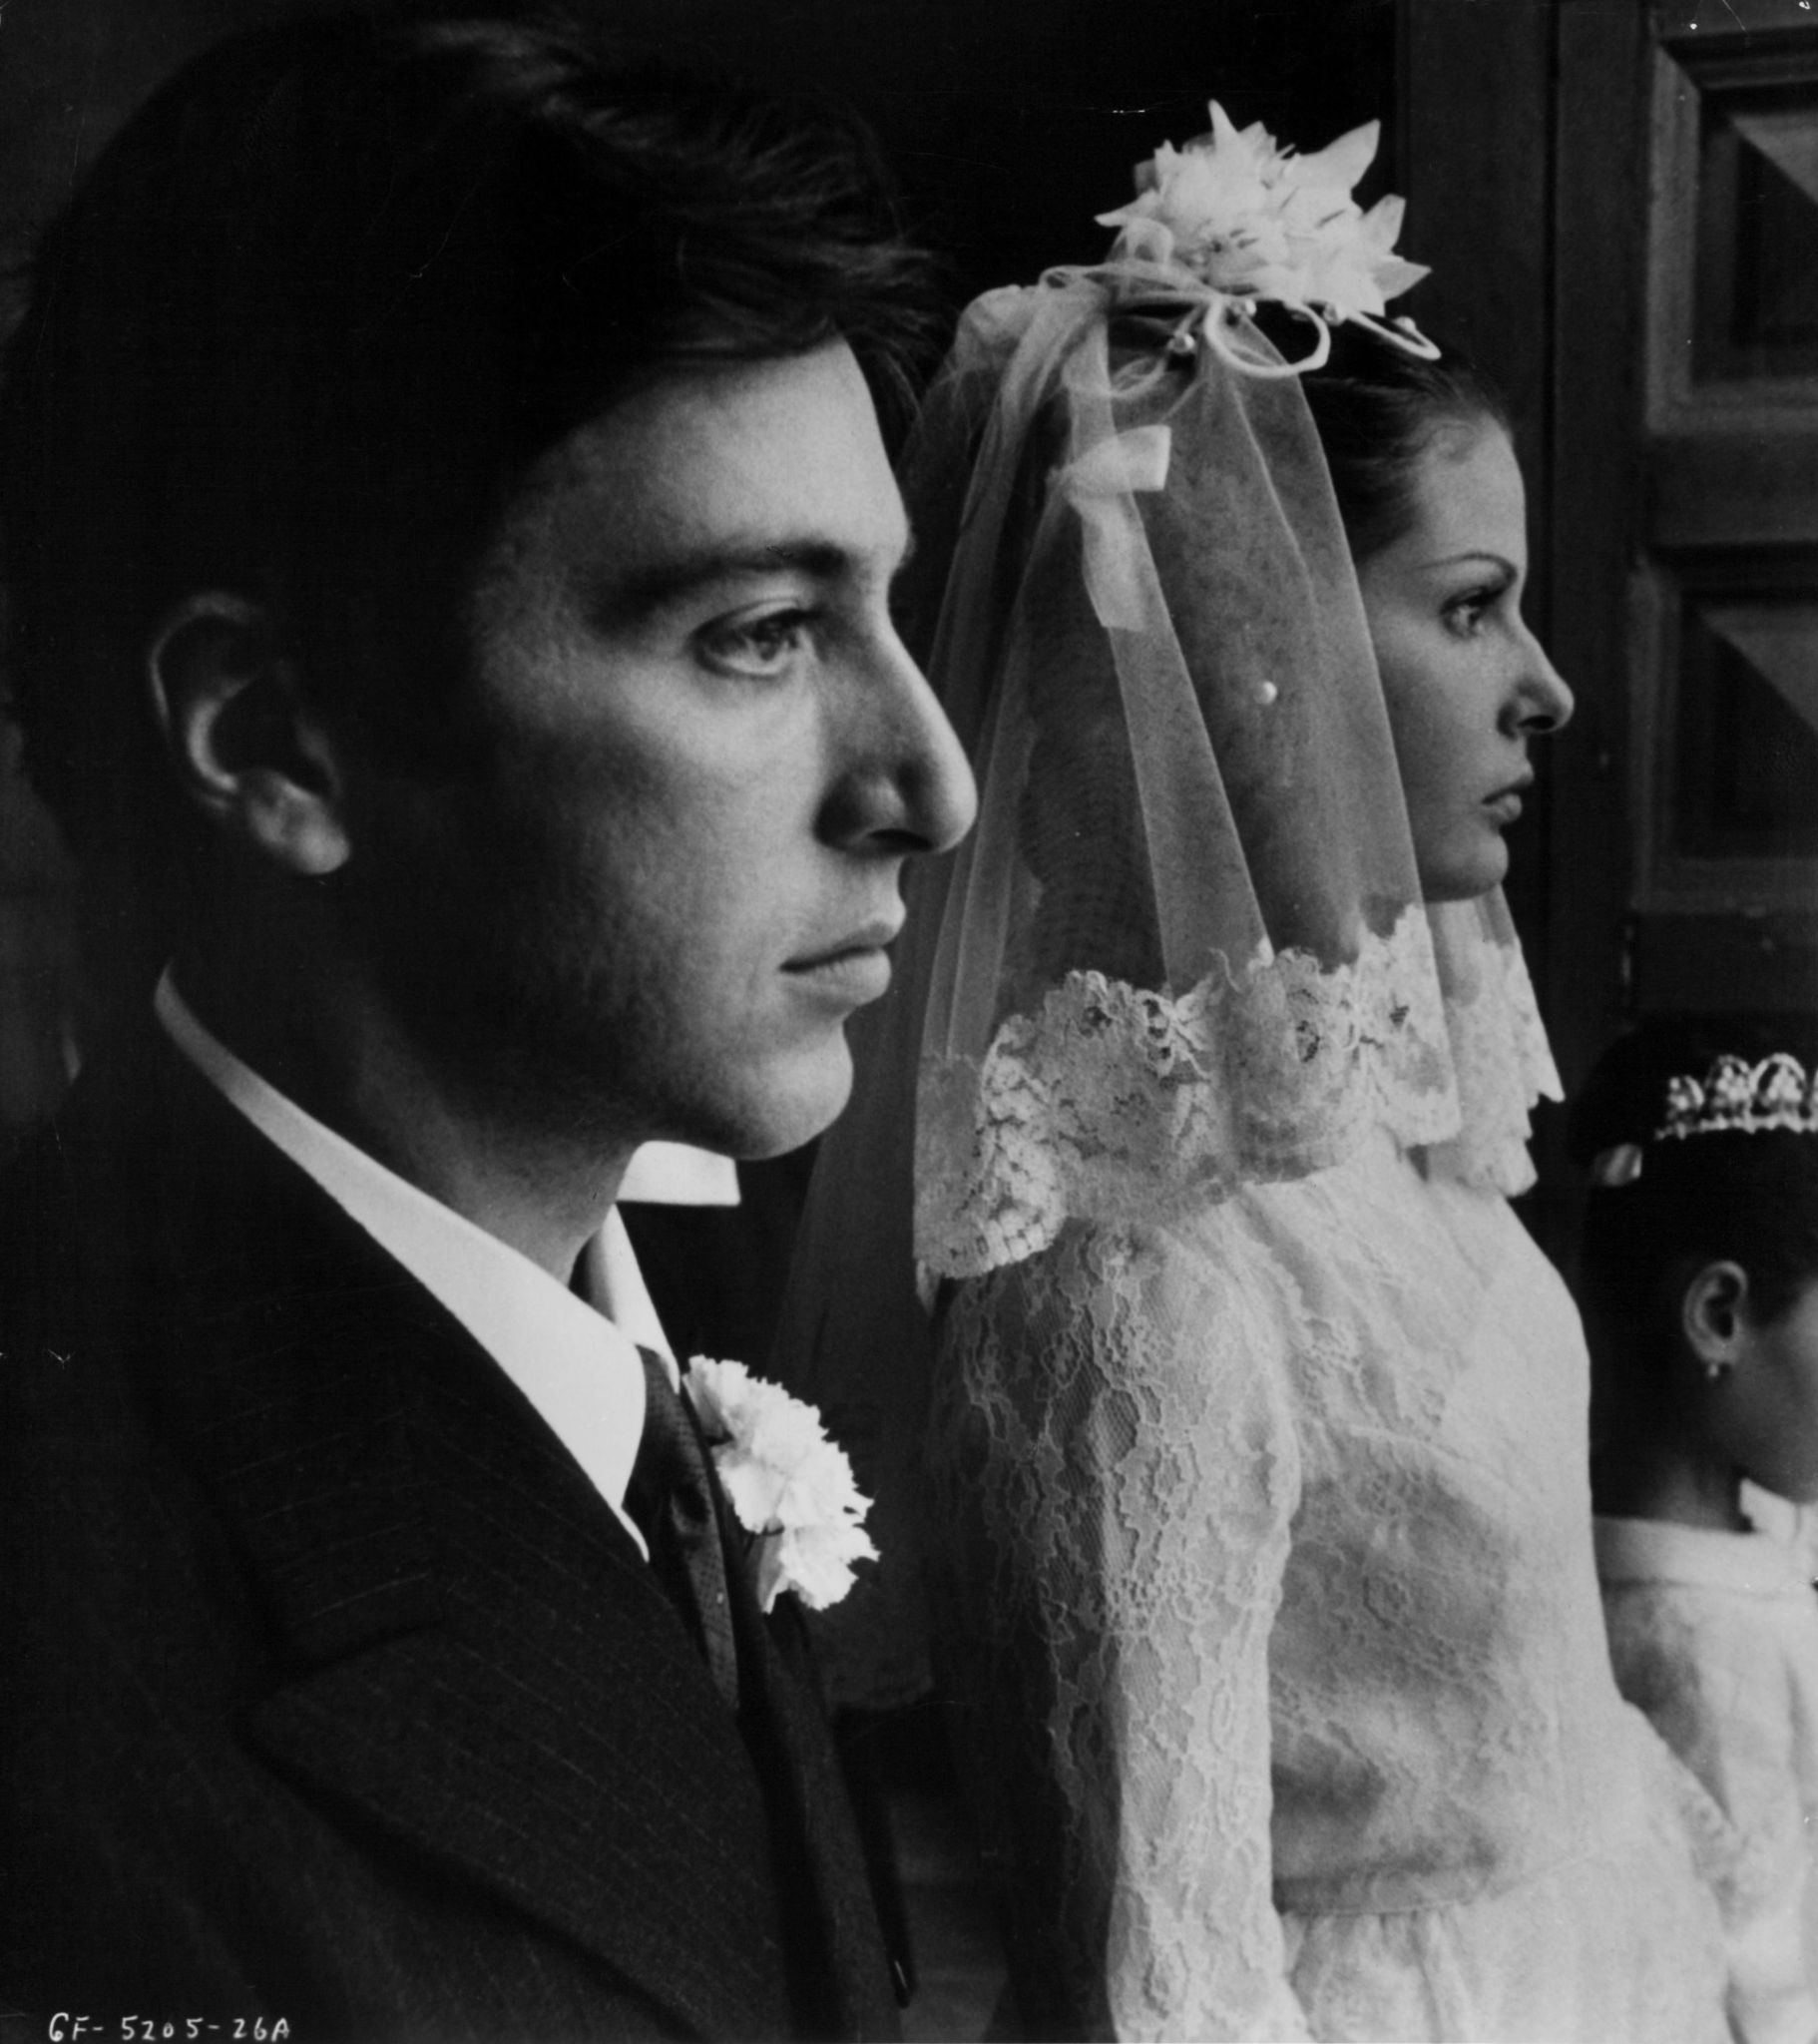 Al Pacino and Simonetta Stefanelli in The Godfather (1972)